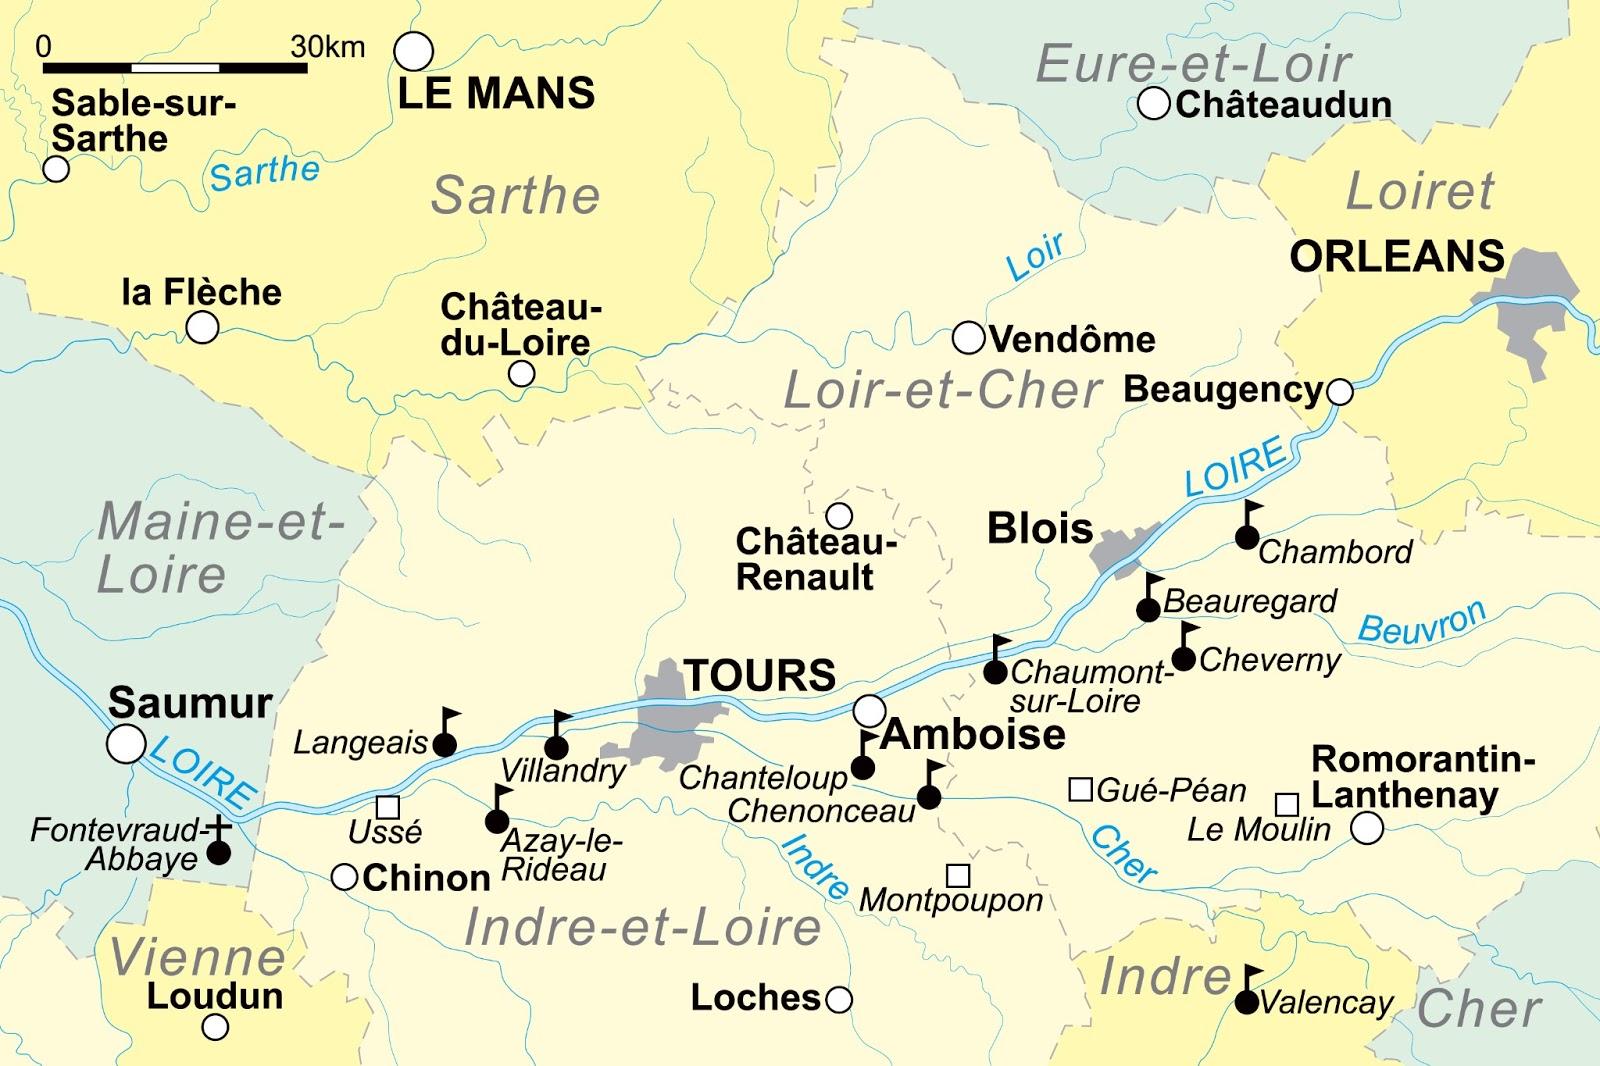 frankrijk loire kaart